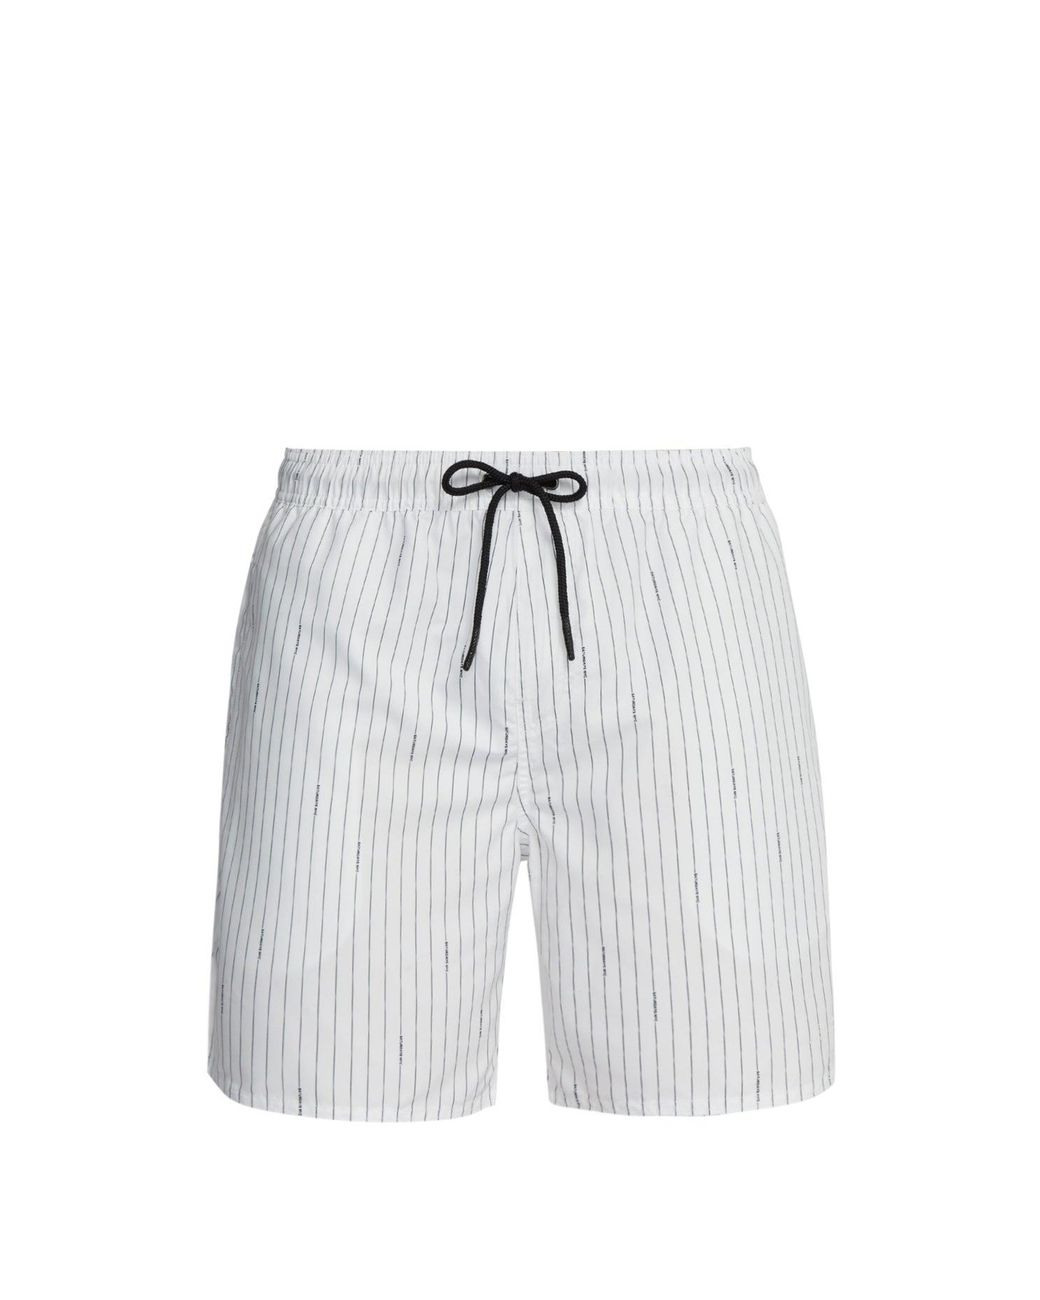 JERECY Mens Swim Trunks Geometric Orange White Polka Dot Quick Dry Board Shorts with Drawstring and Pockets